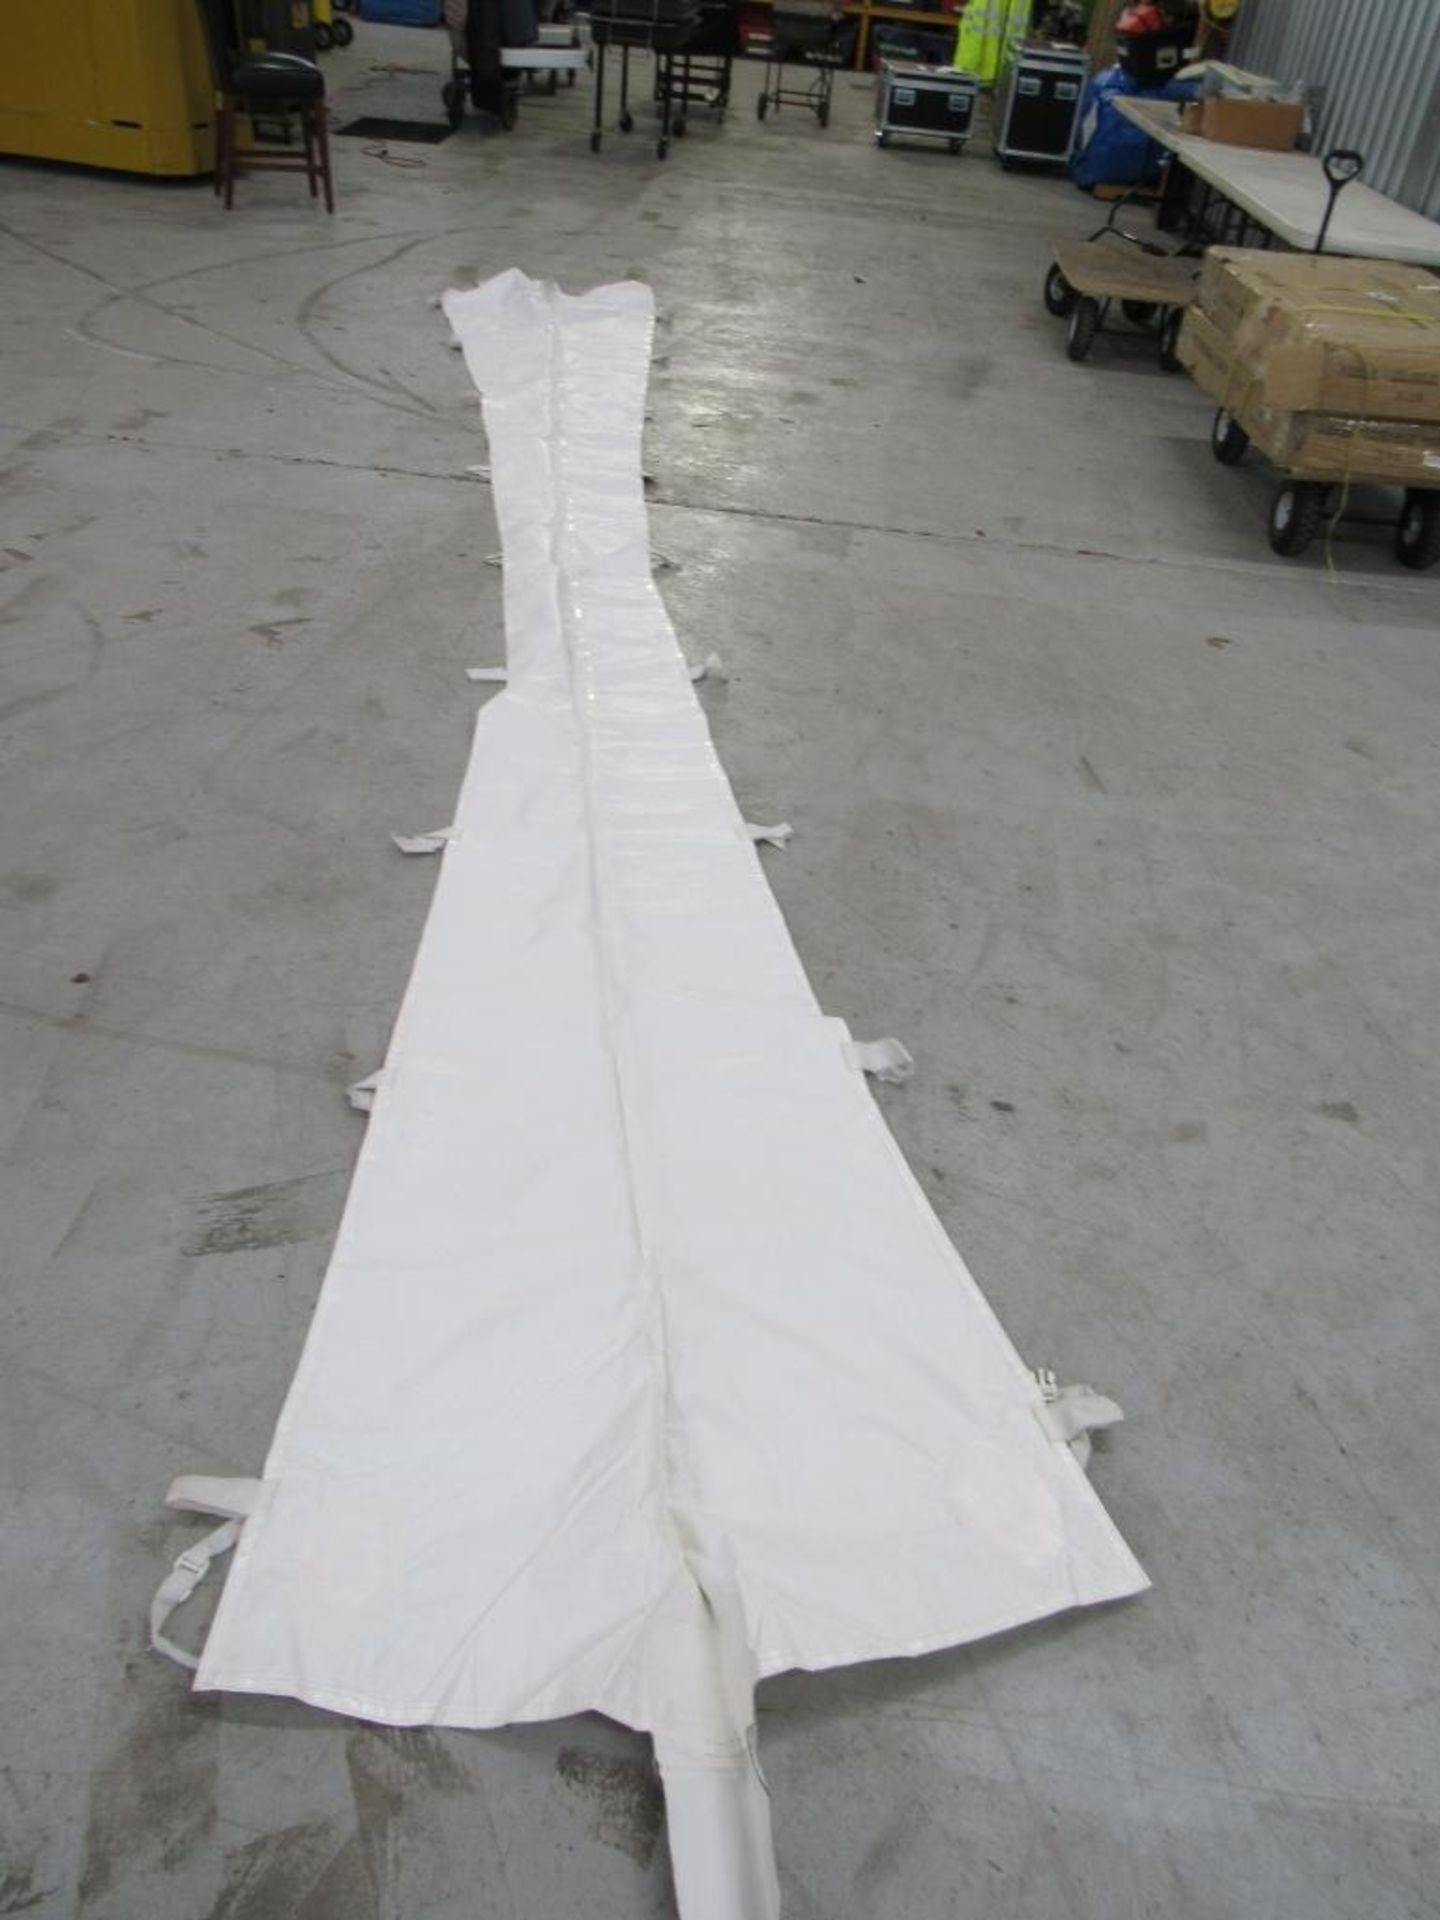 Lot 67 - PINNACLE Rain Gutters, 20 ft. Tent (2) Pieces